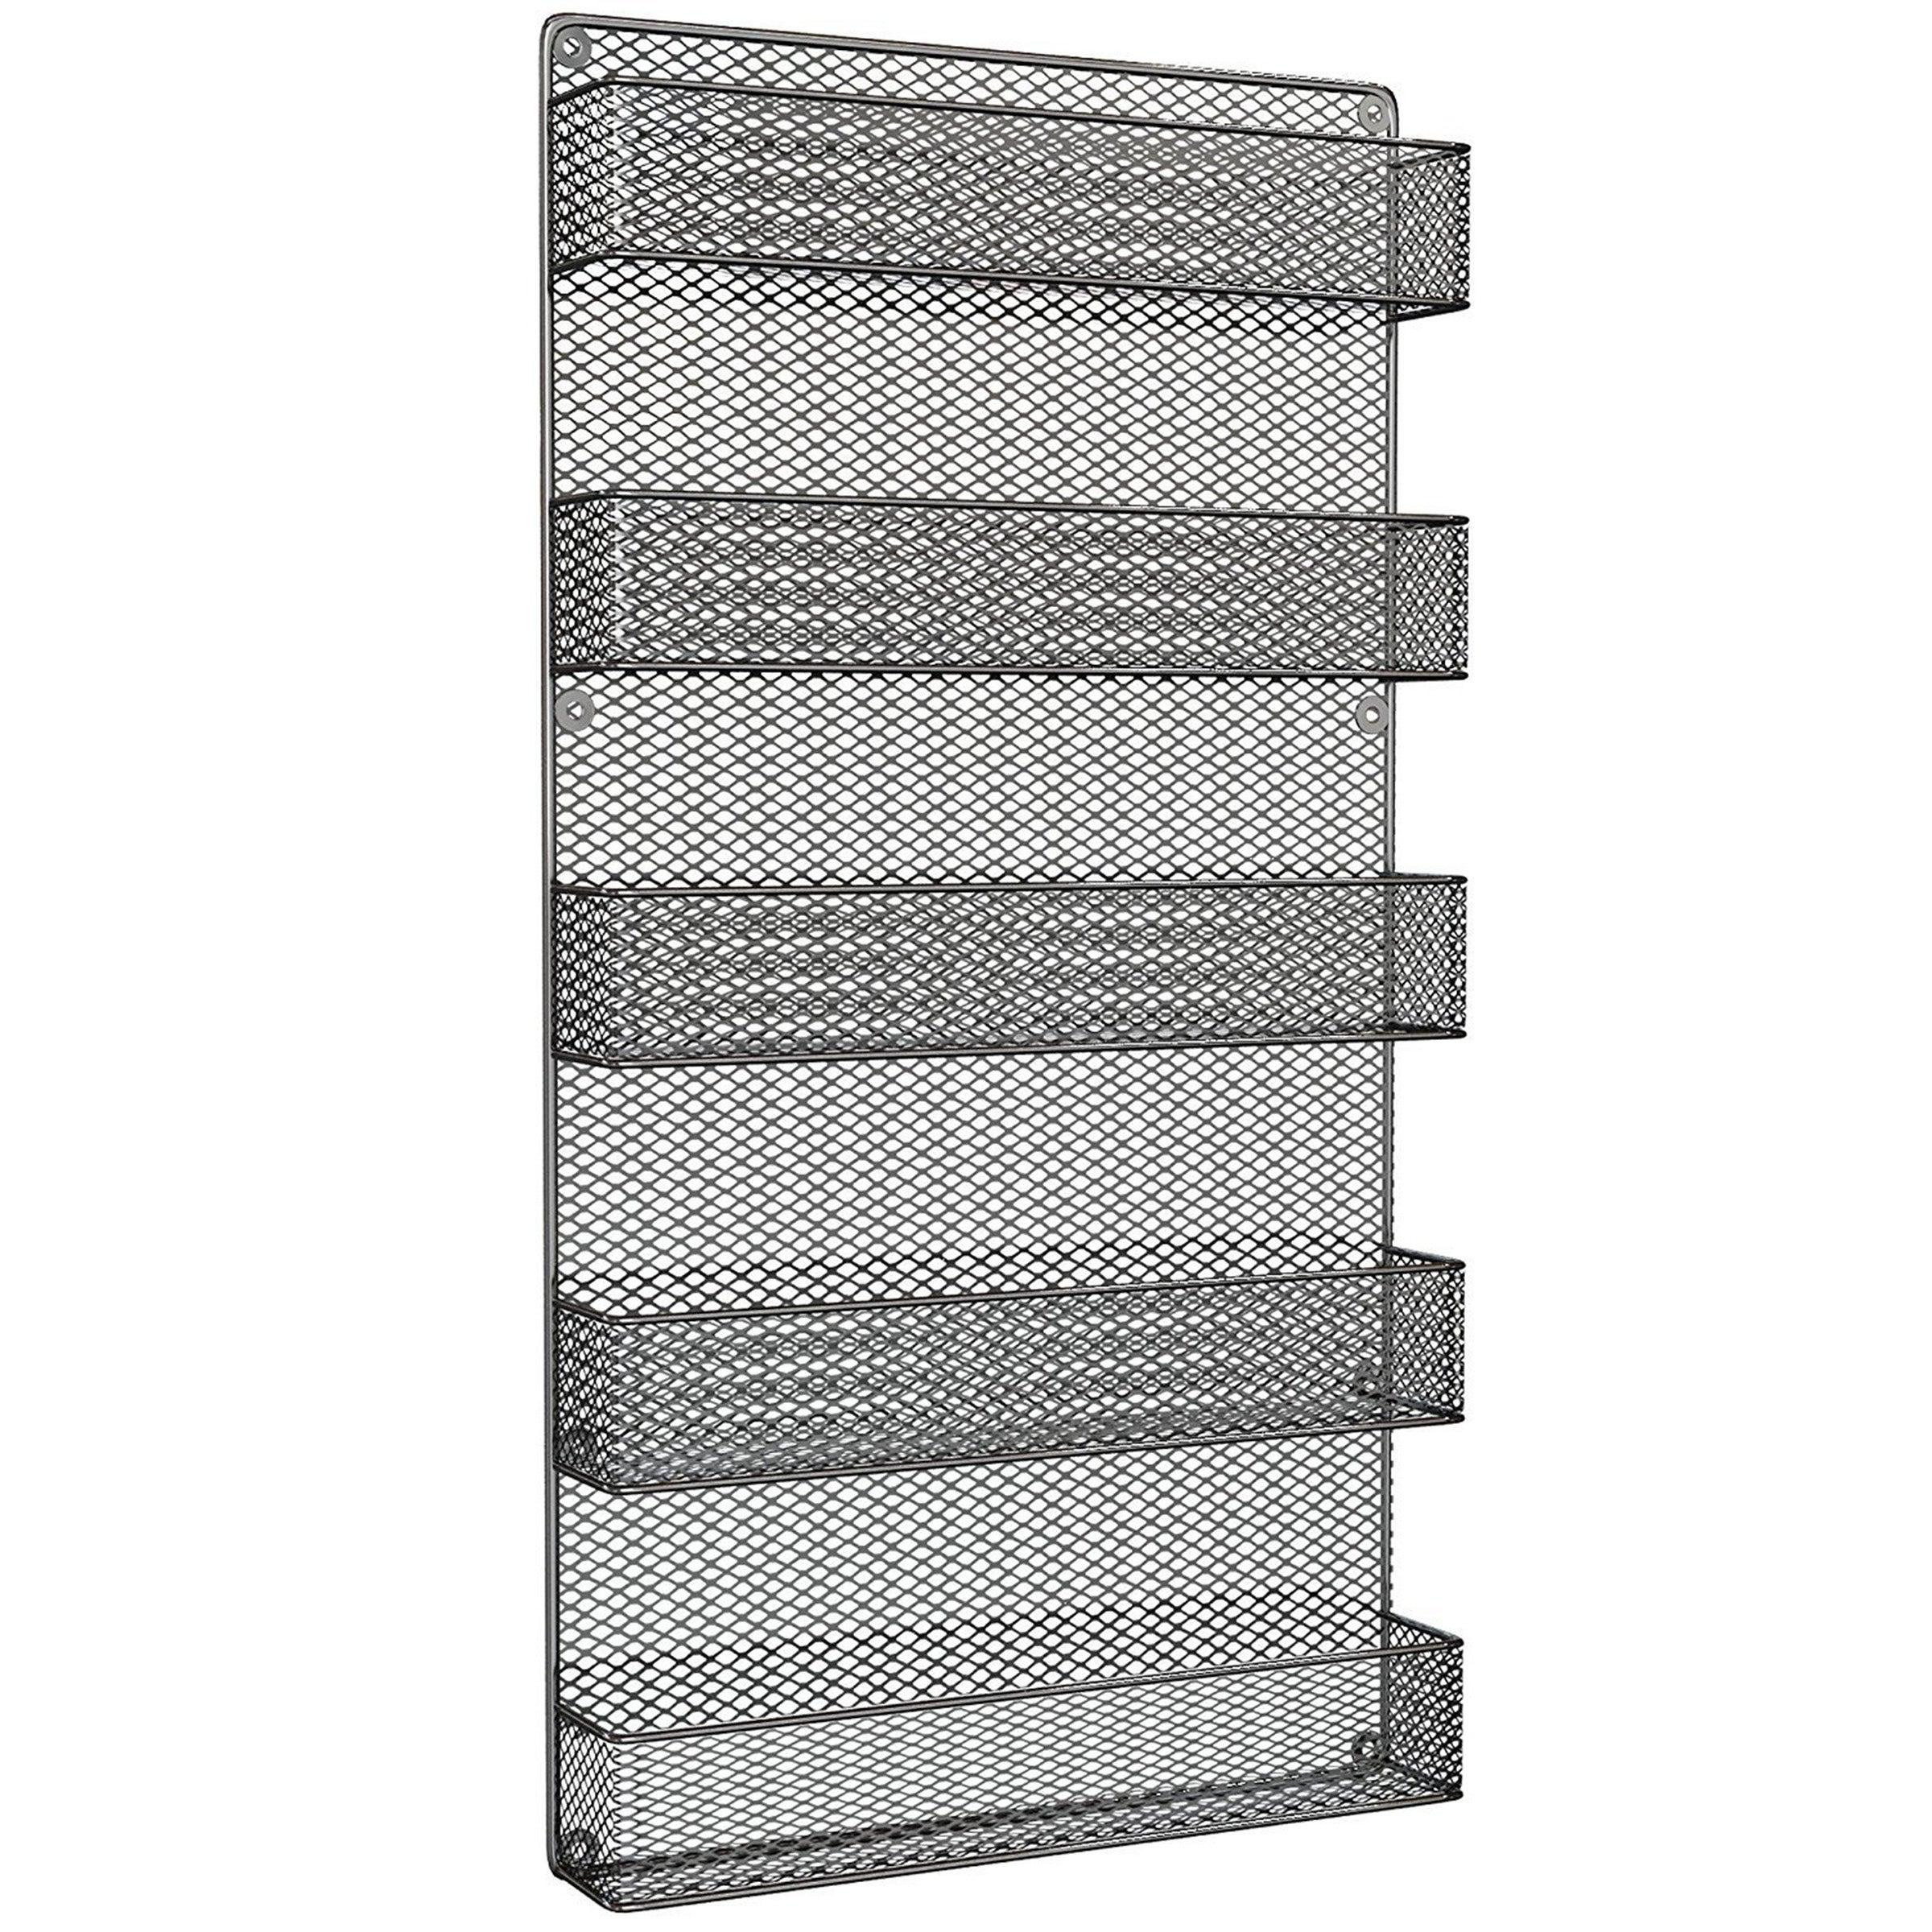 Spice Rack Organizer-Space Saving Wall Mount 5 Tier Storage Shelves by Home-Complete  sc 1 st  Overstock.com & Buy Spice Racks Online at Overstock.com | Our Best Kitchen Storage Deals